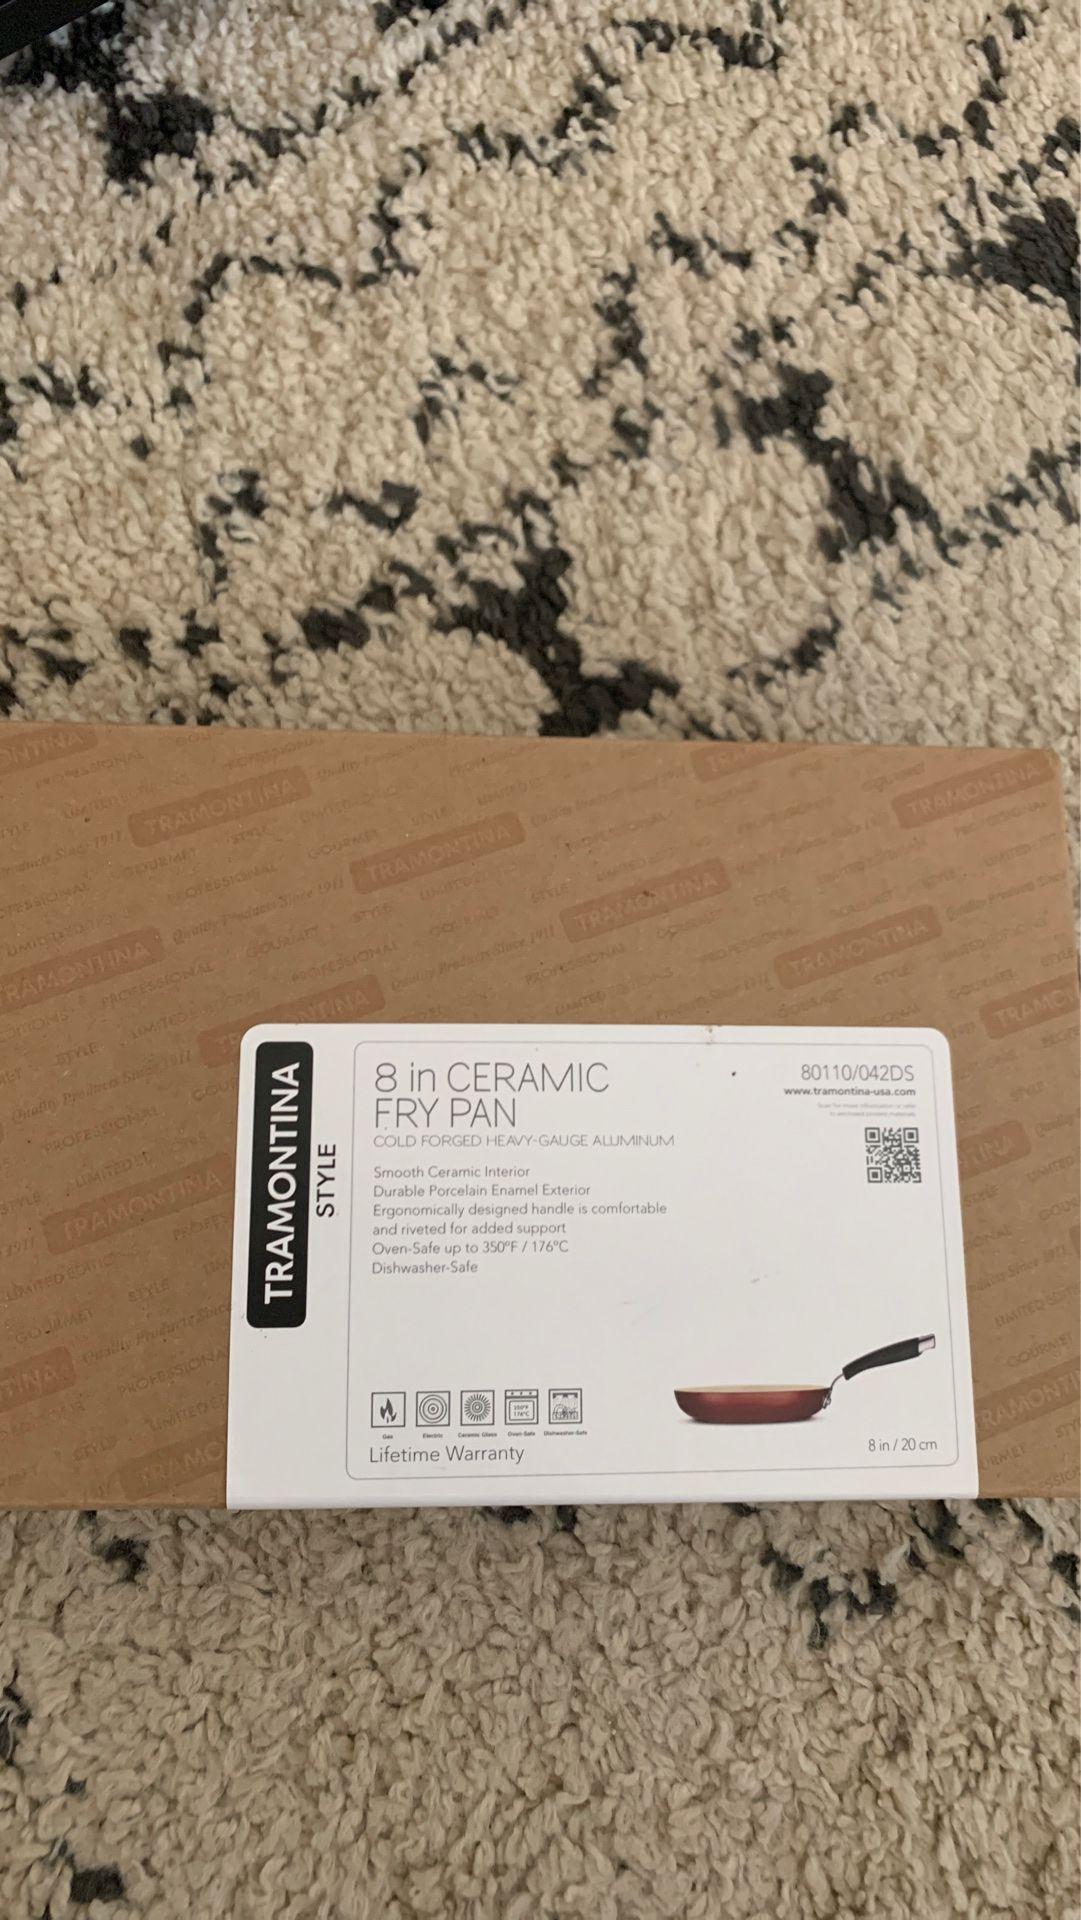 Brand new Tramontina 8 inch ceramic Fry Pan- brand new